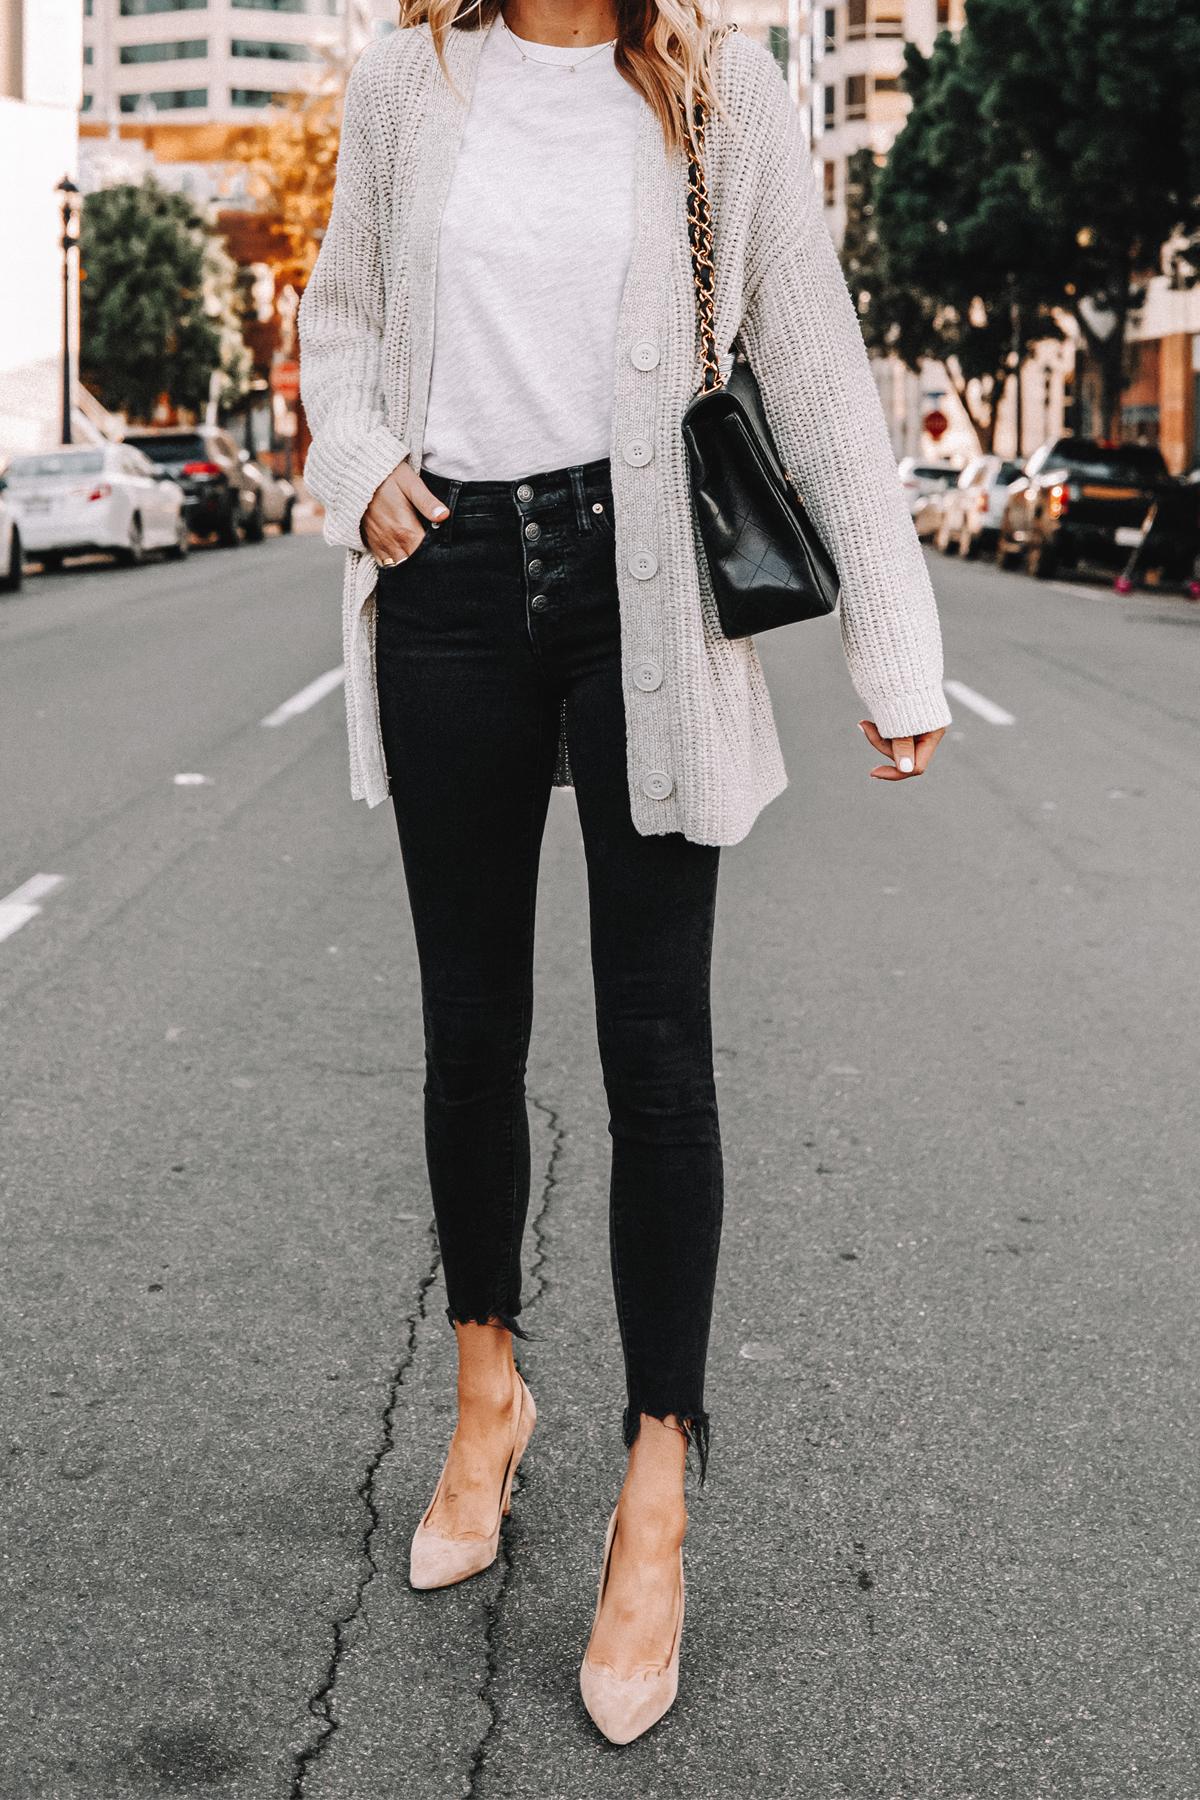 Fashion Jackson Wearing Oversized Cardigan White Tshirt Black Skinny Jeans Nude Pumps 1